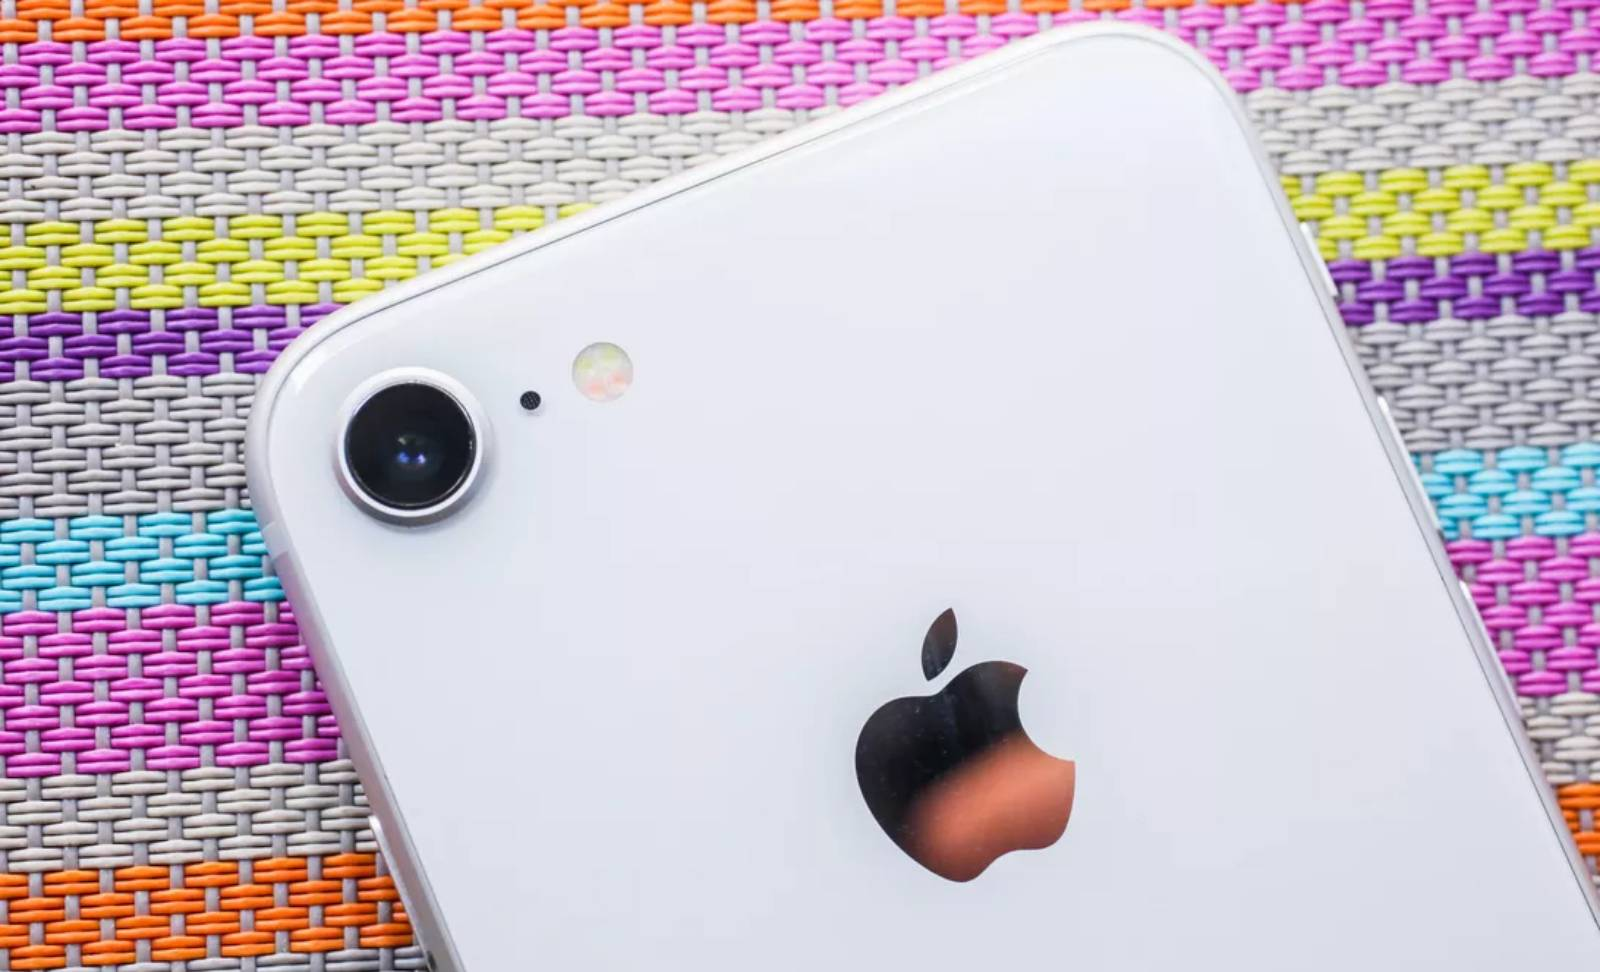 iPhone 9 productie Coronavirus